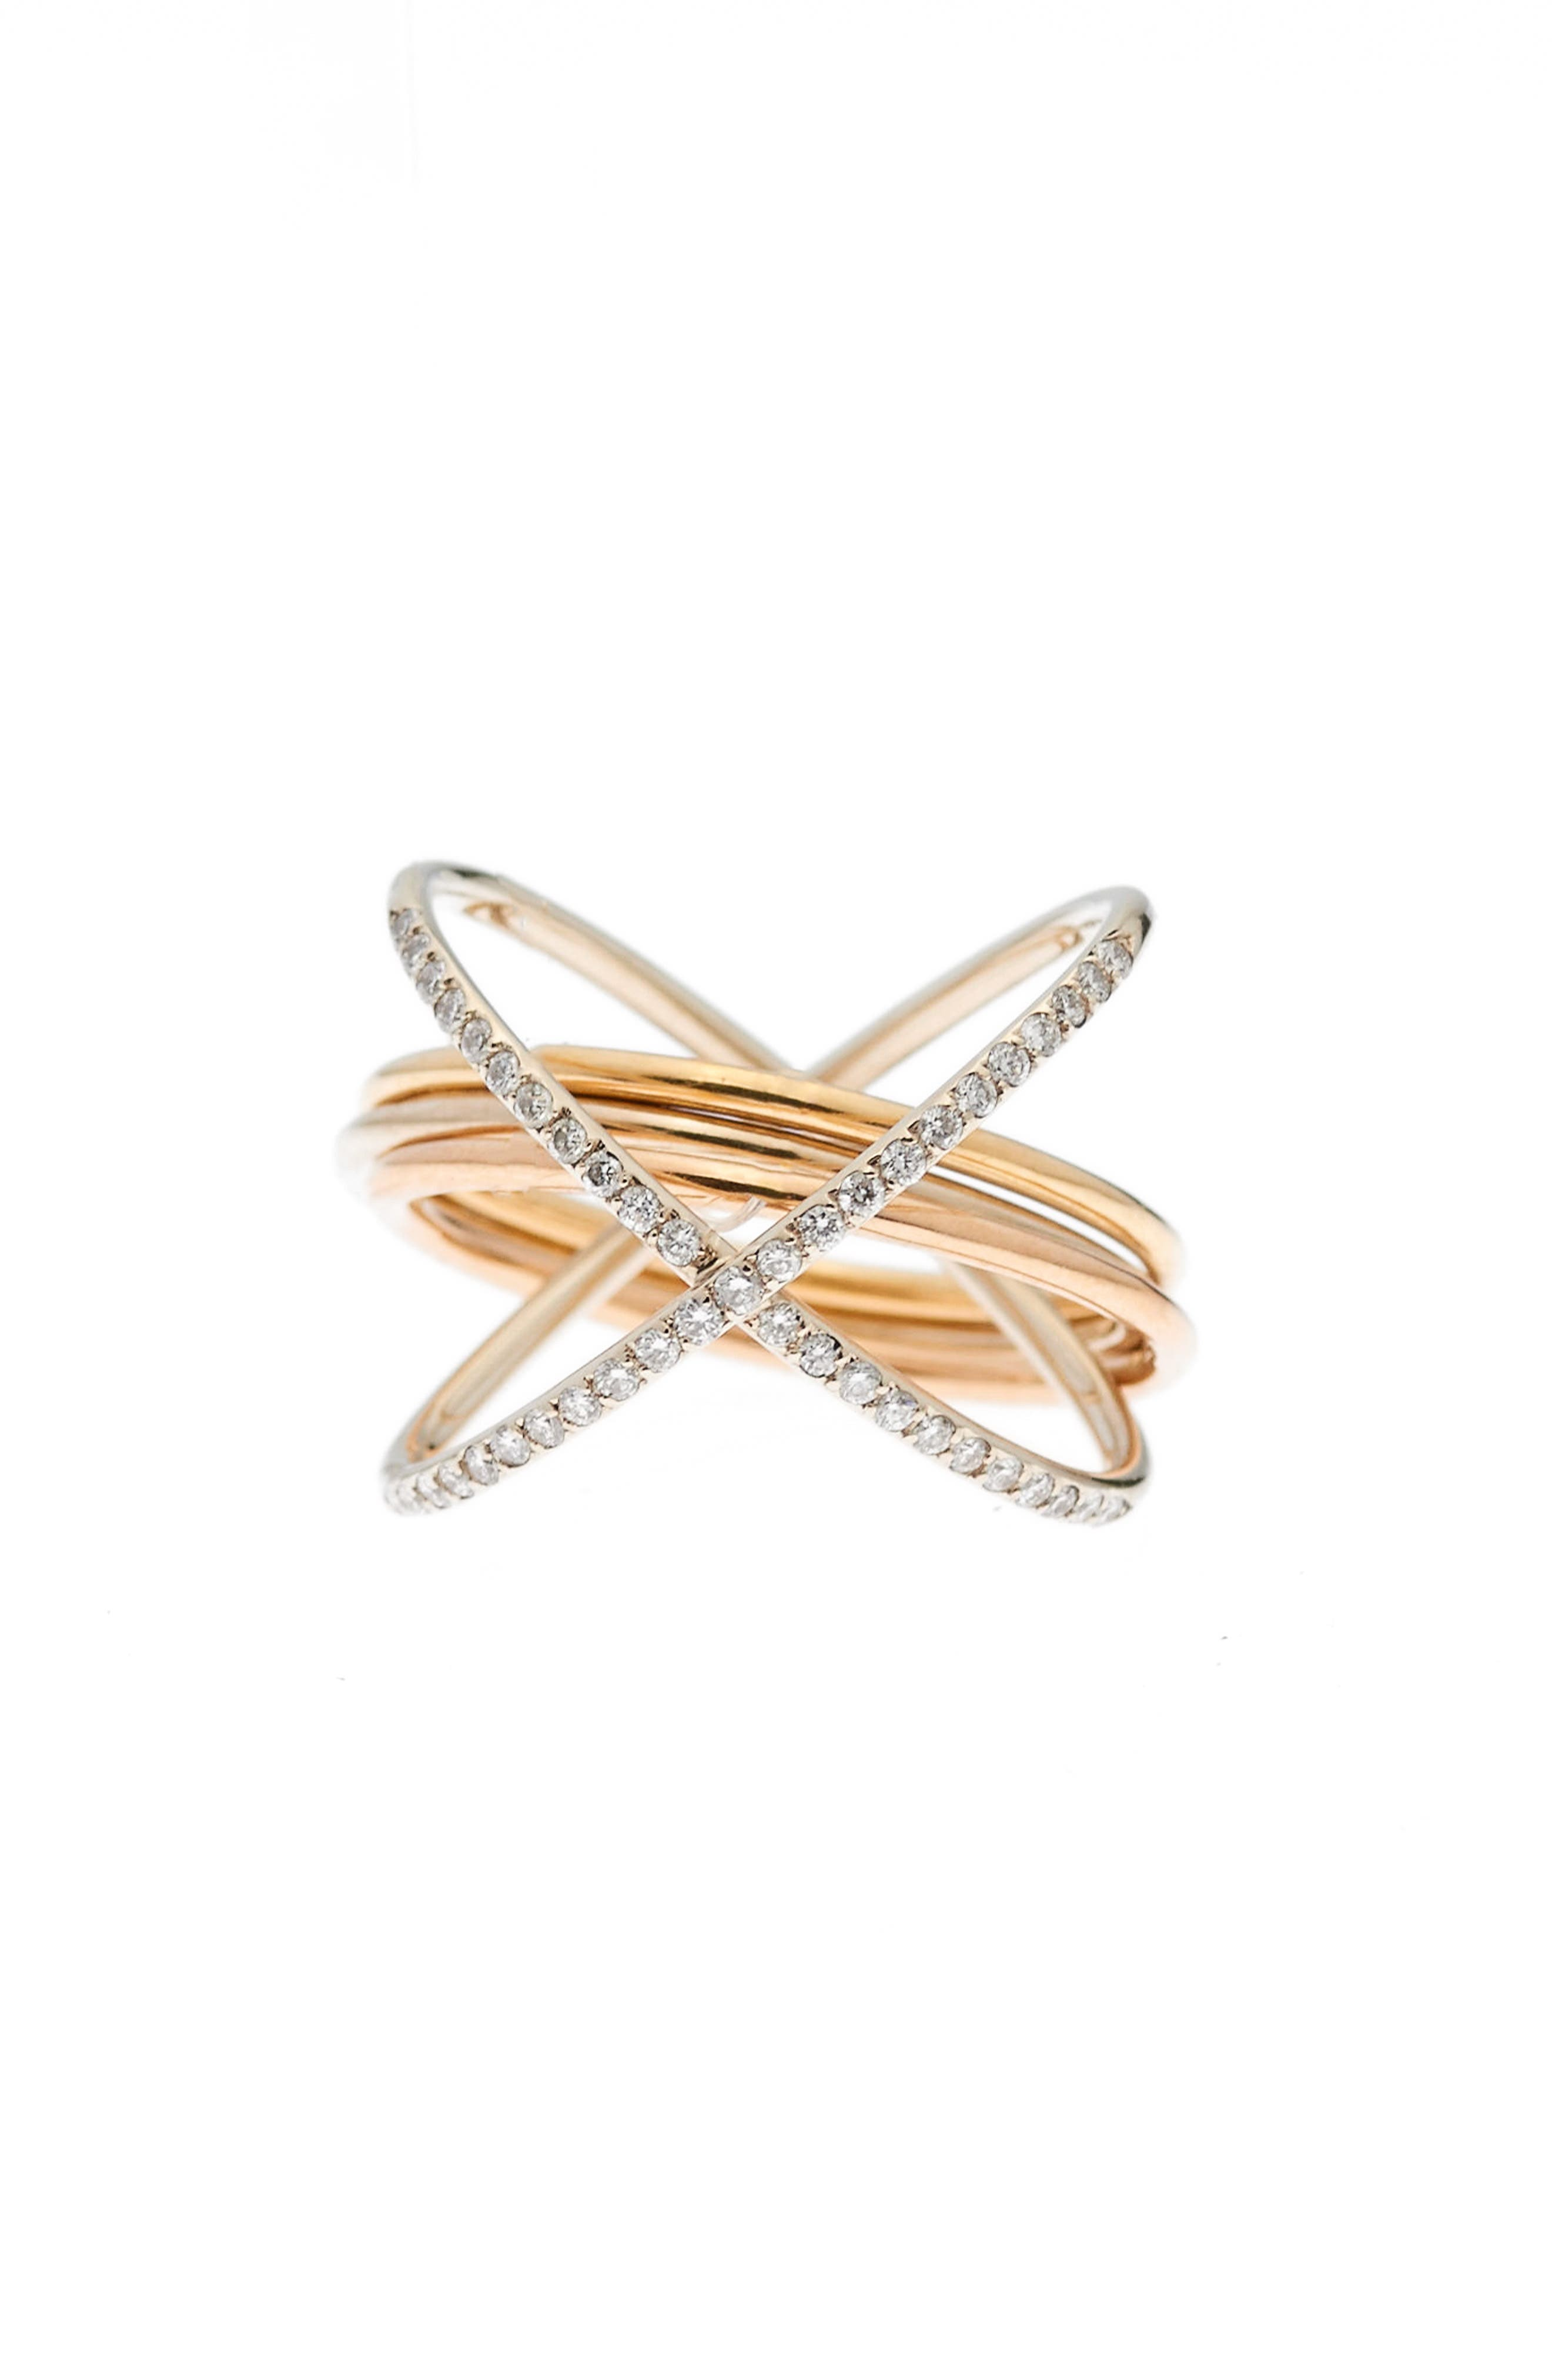 Main Image - Charlotte Chesnais XXO Diamond Ring